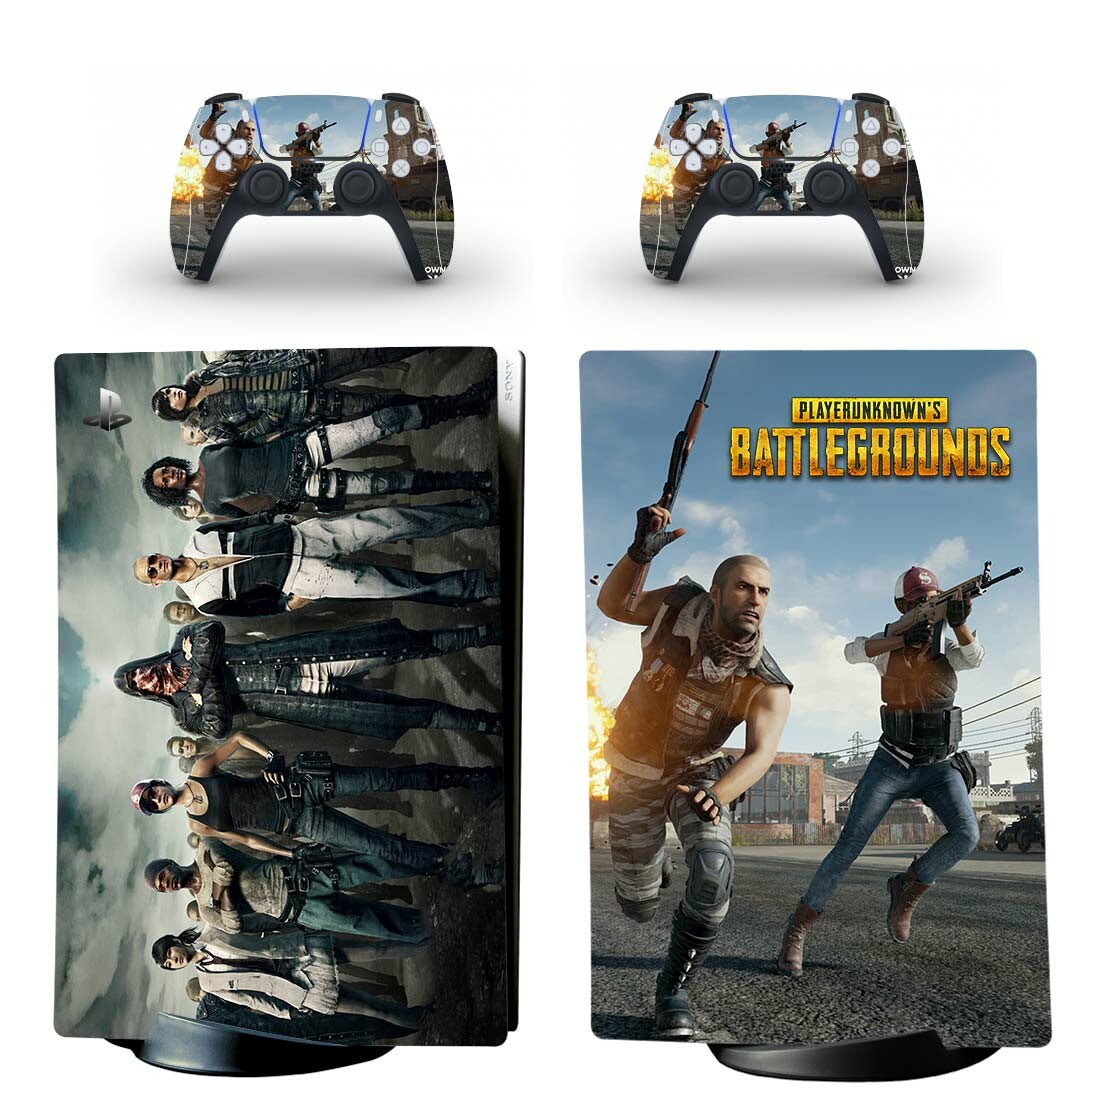 PlayerUnknown's Battlegrounds PS5 Digital Edition Skin Sticker Decal Design 1